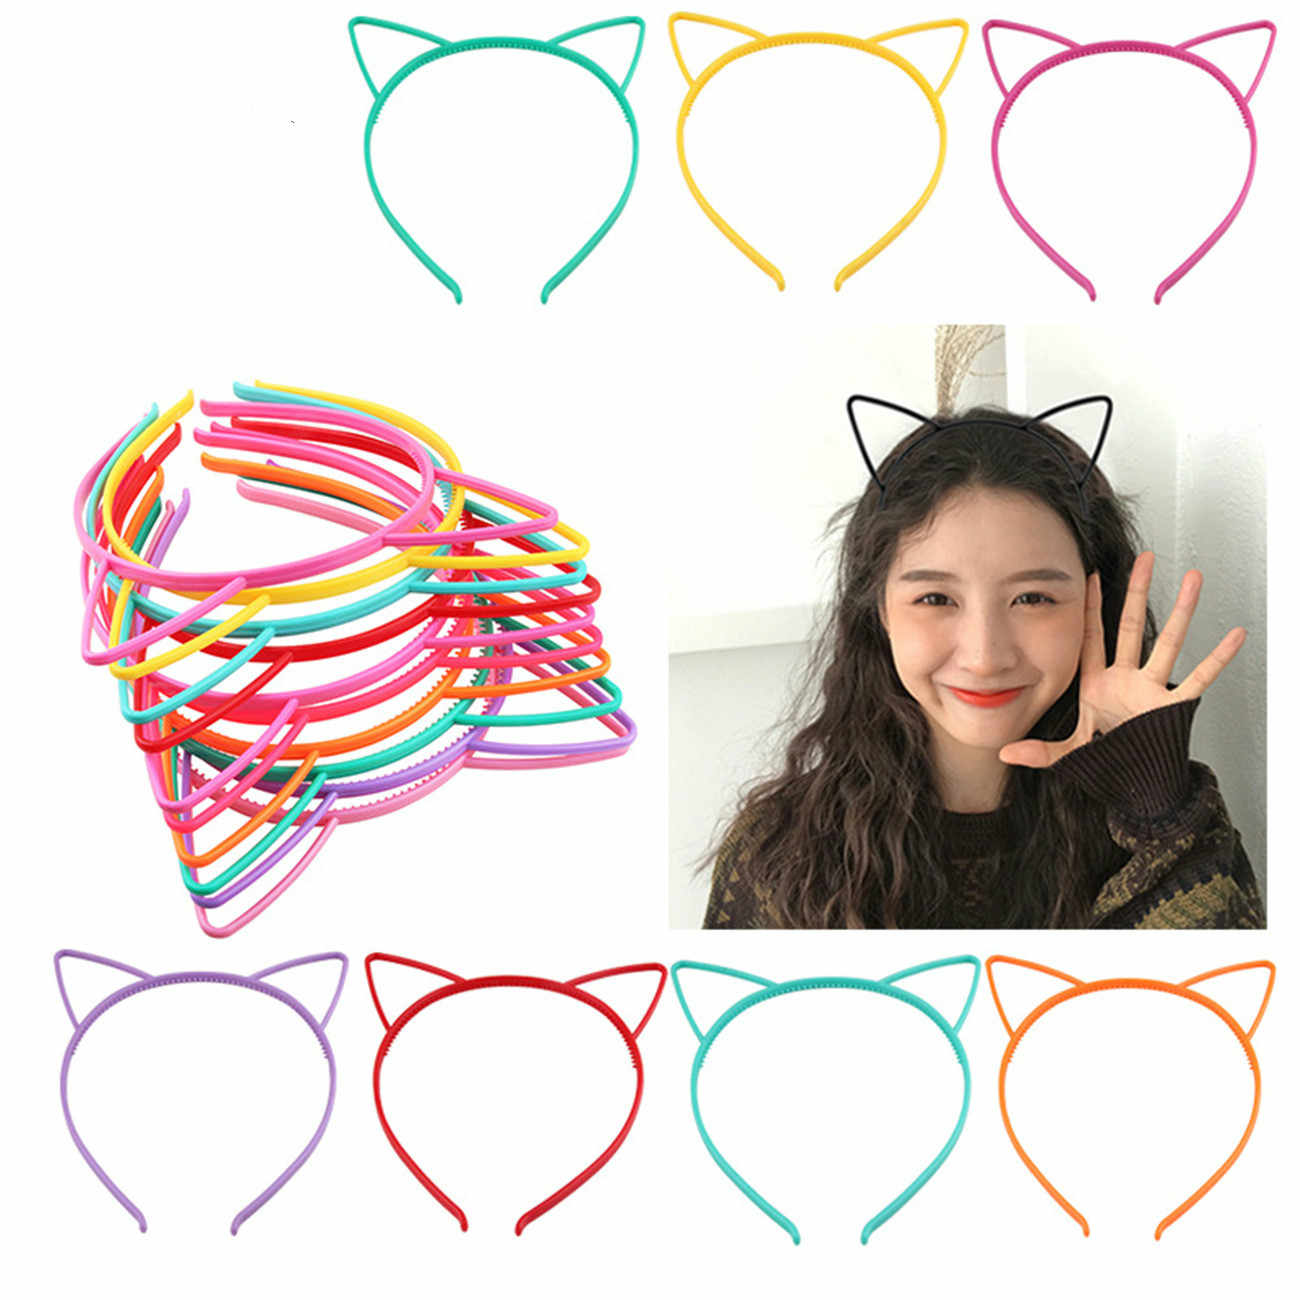 Cat Ears Headbands Crown Tiara Princess with Plastic Animal Hair Band Butterfly Bow Hoop Accessories Boho Headwear